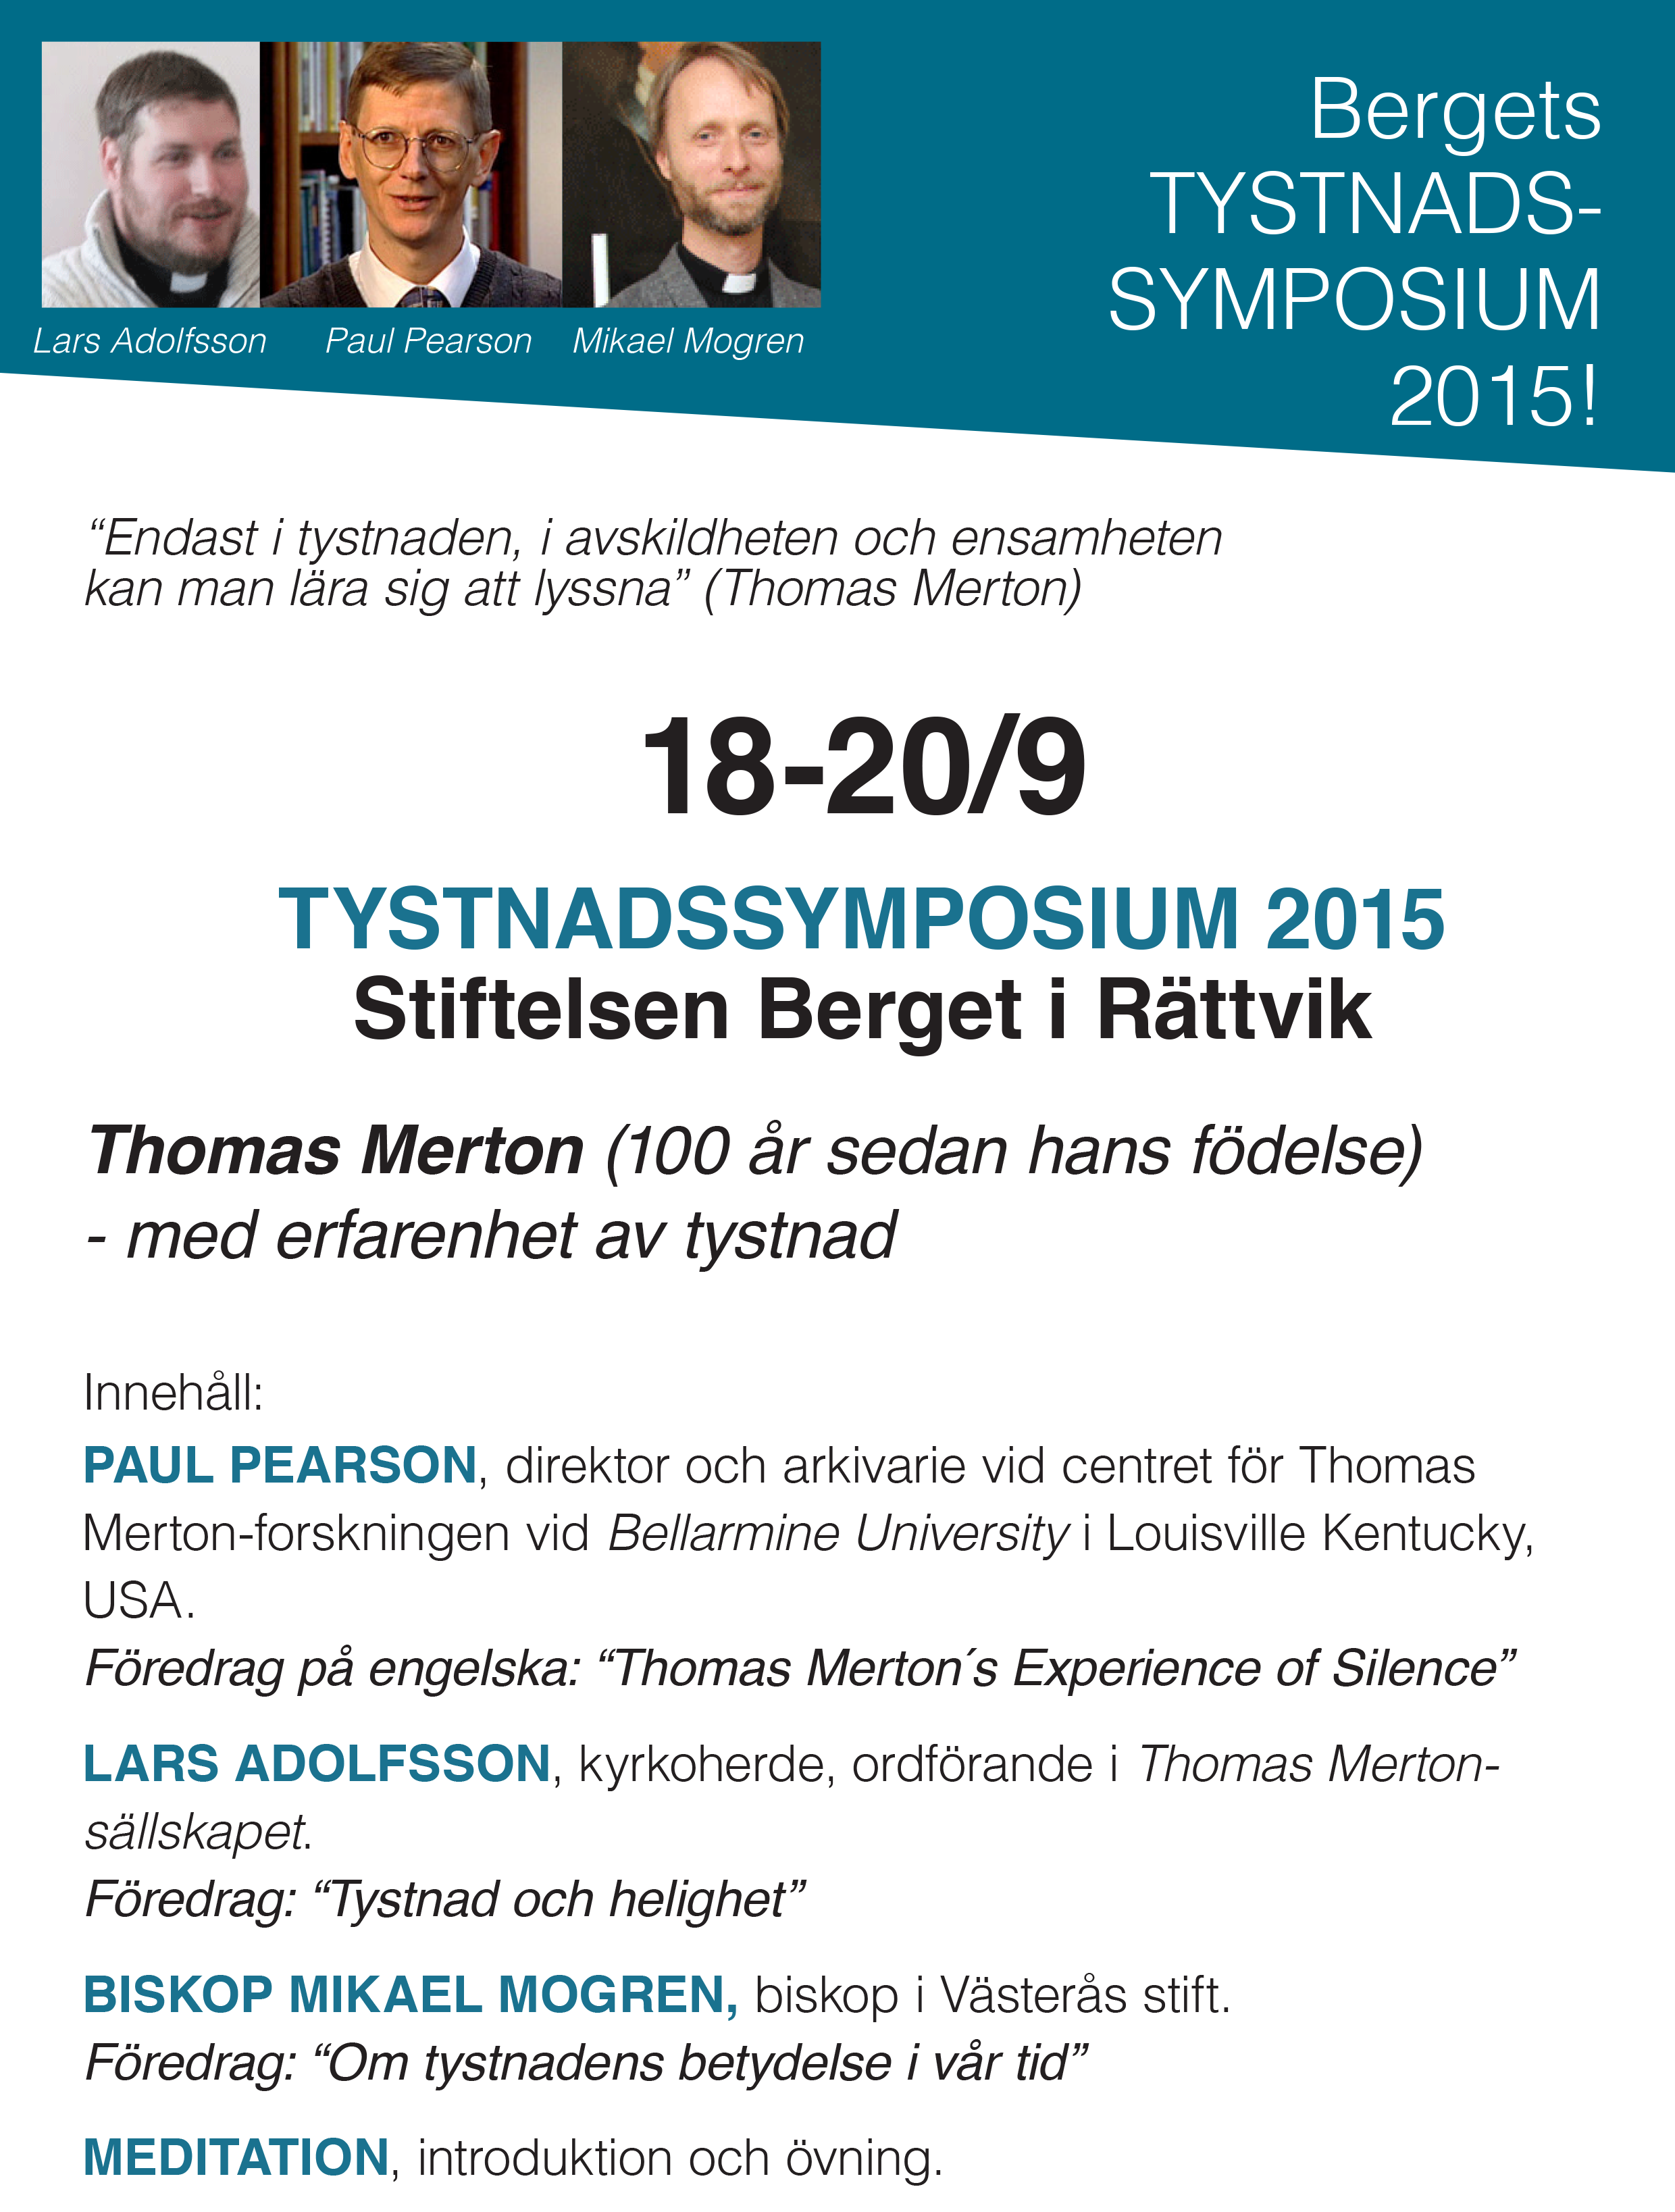 Tystnadssymposiet 2015